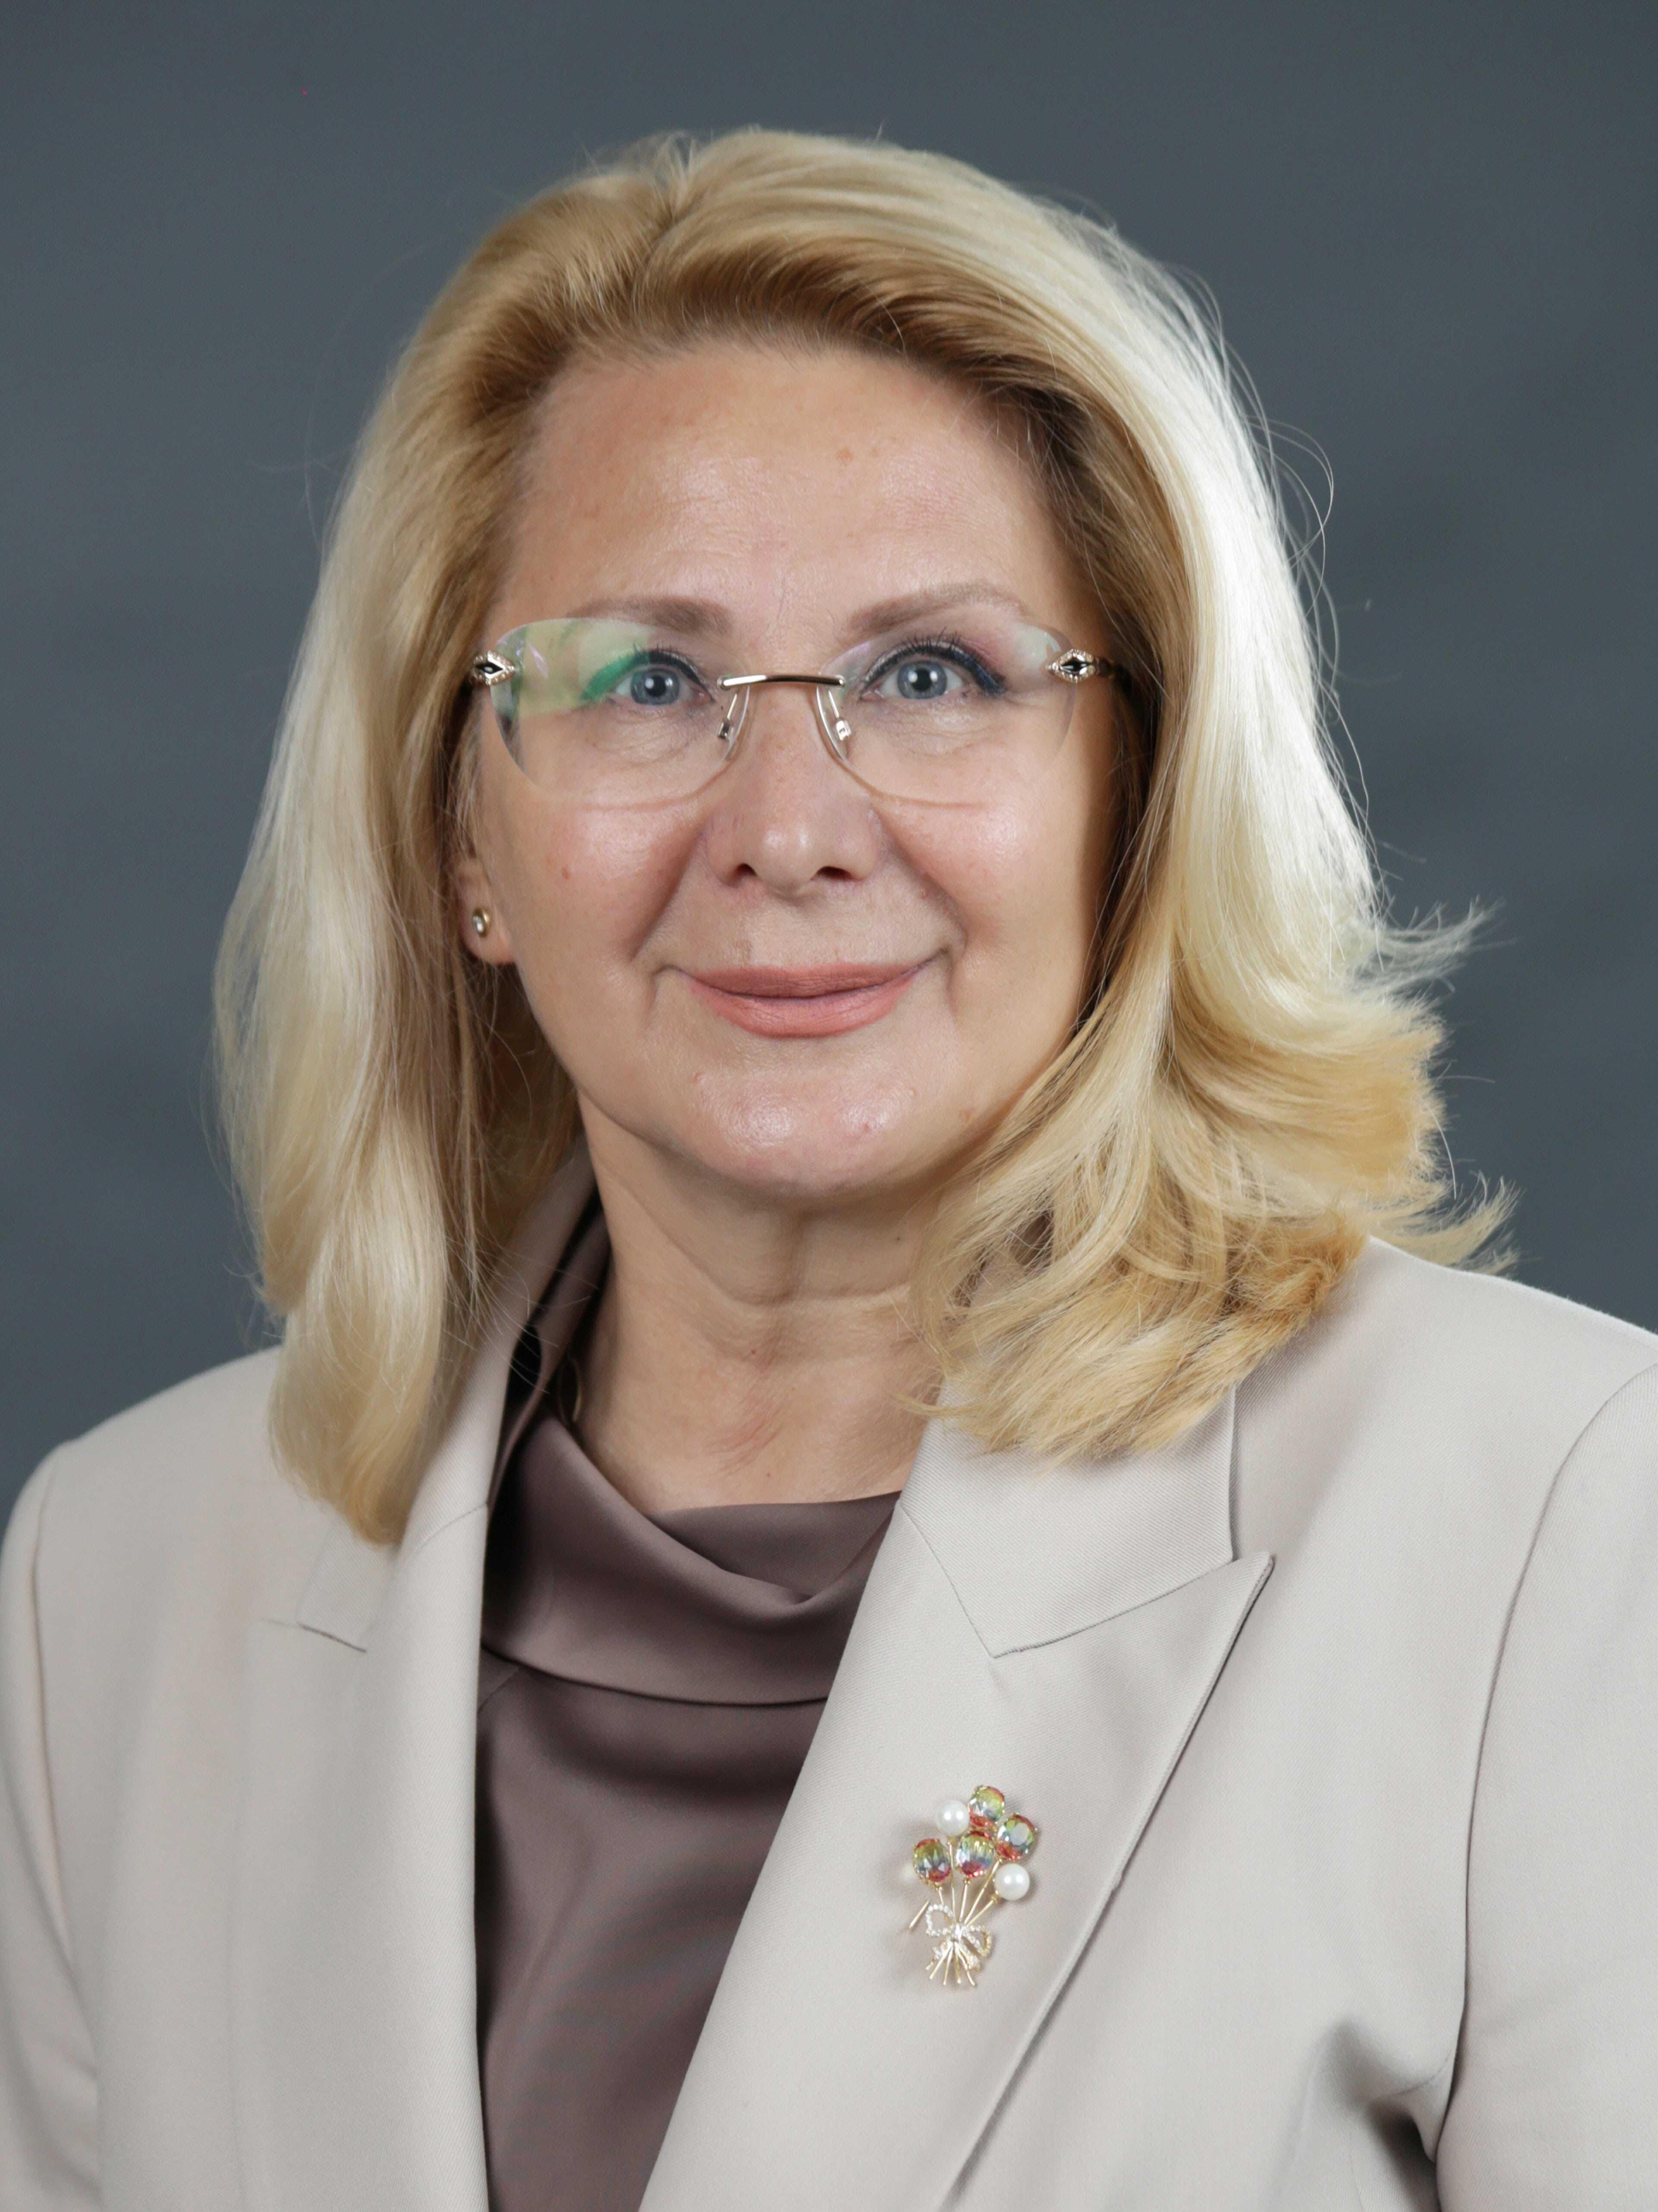 Lejla Haxhiu-Pula